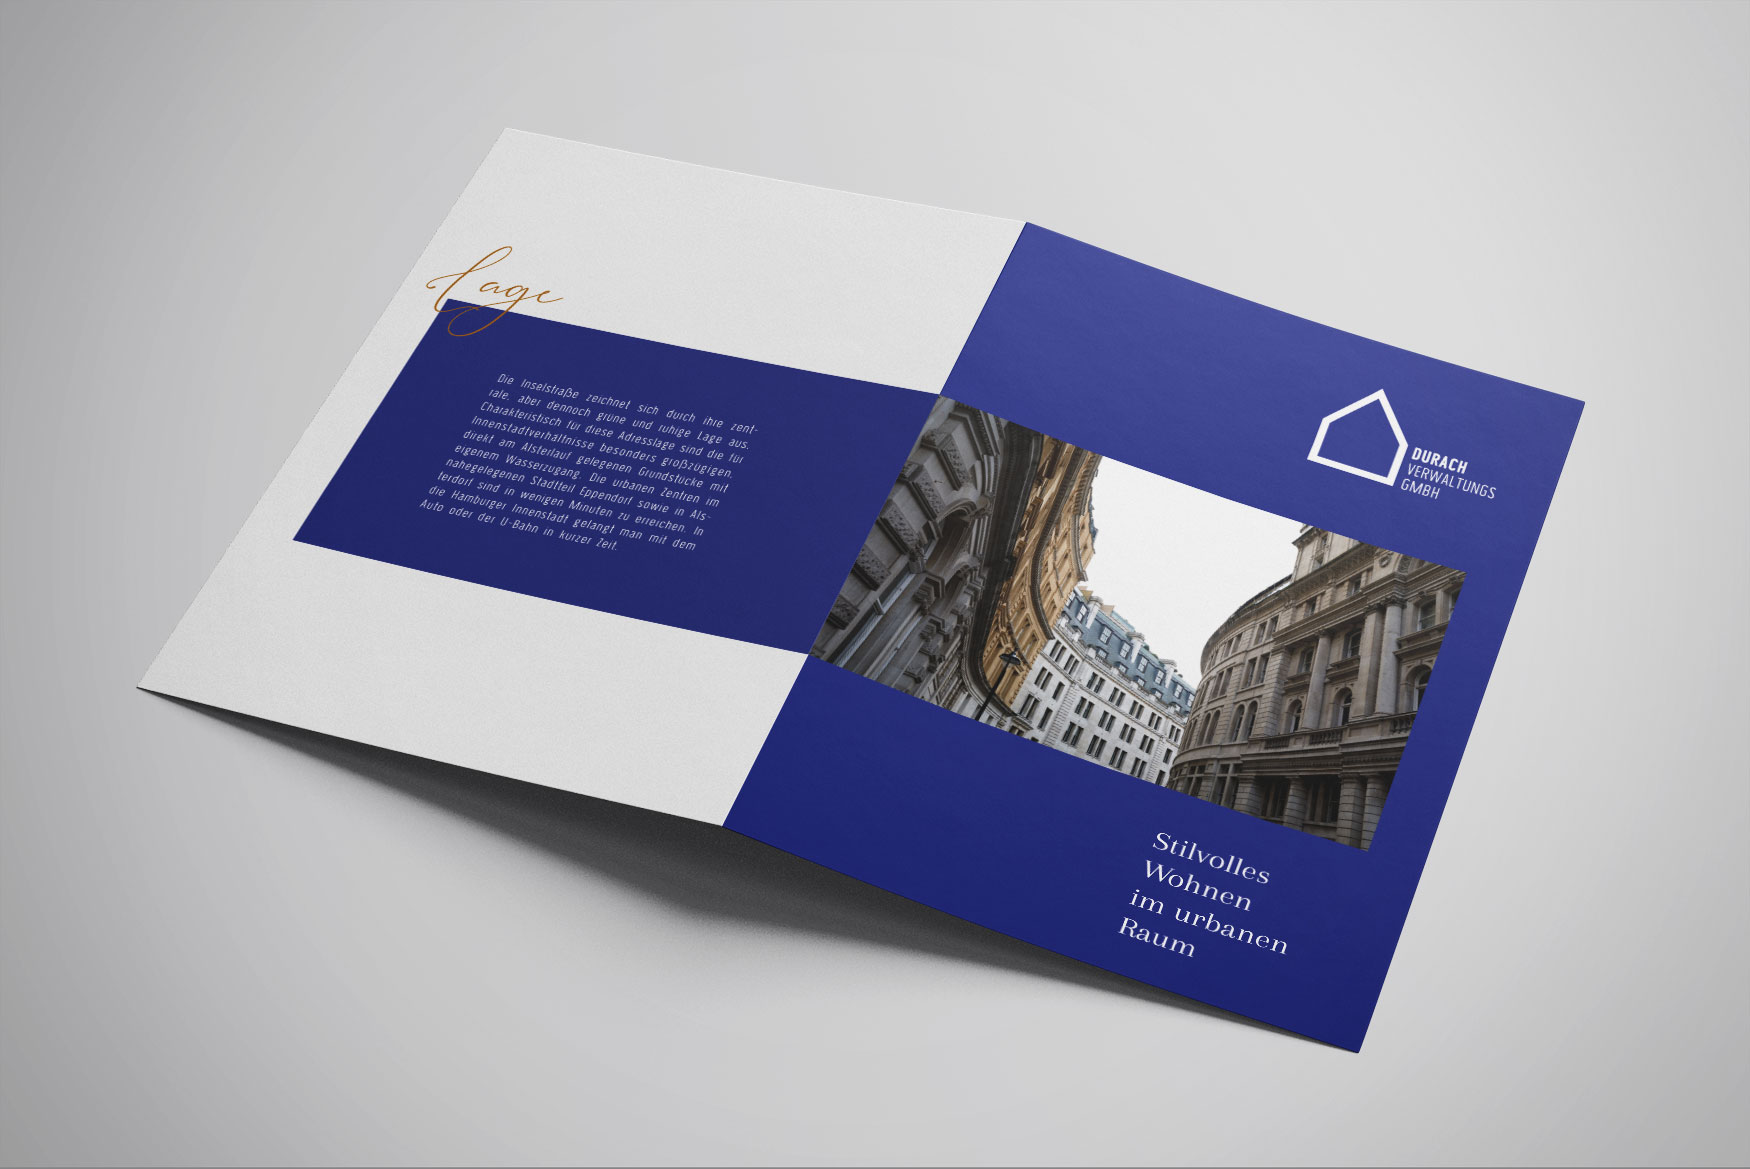 Exposee-Design-Immobilien-3-Designagentur-Stuttgart-Kreativbetrieb